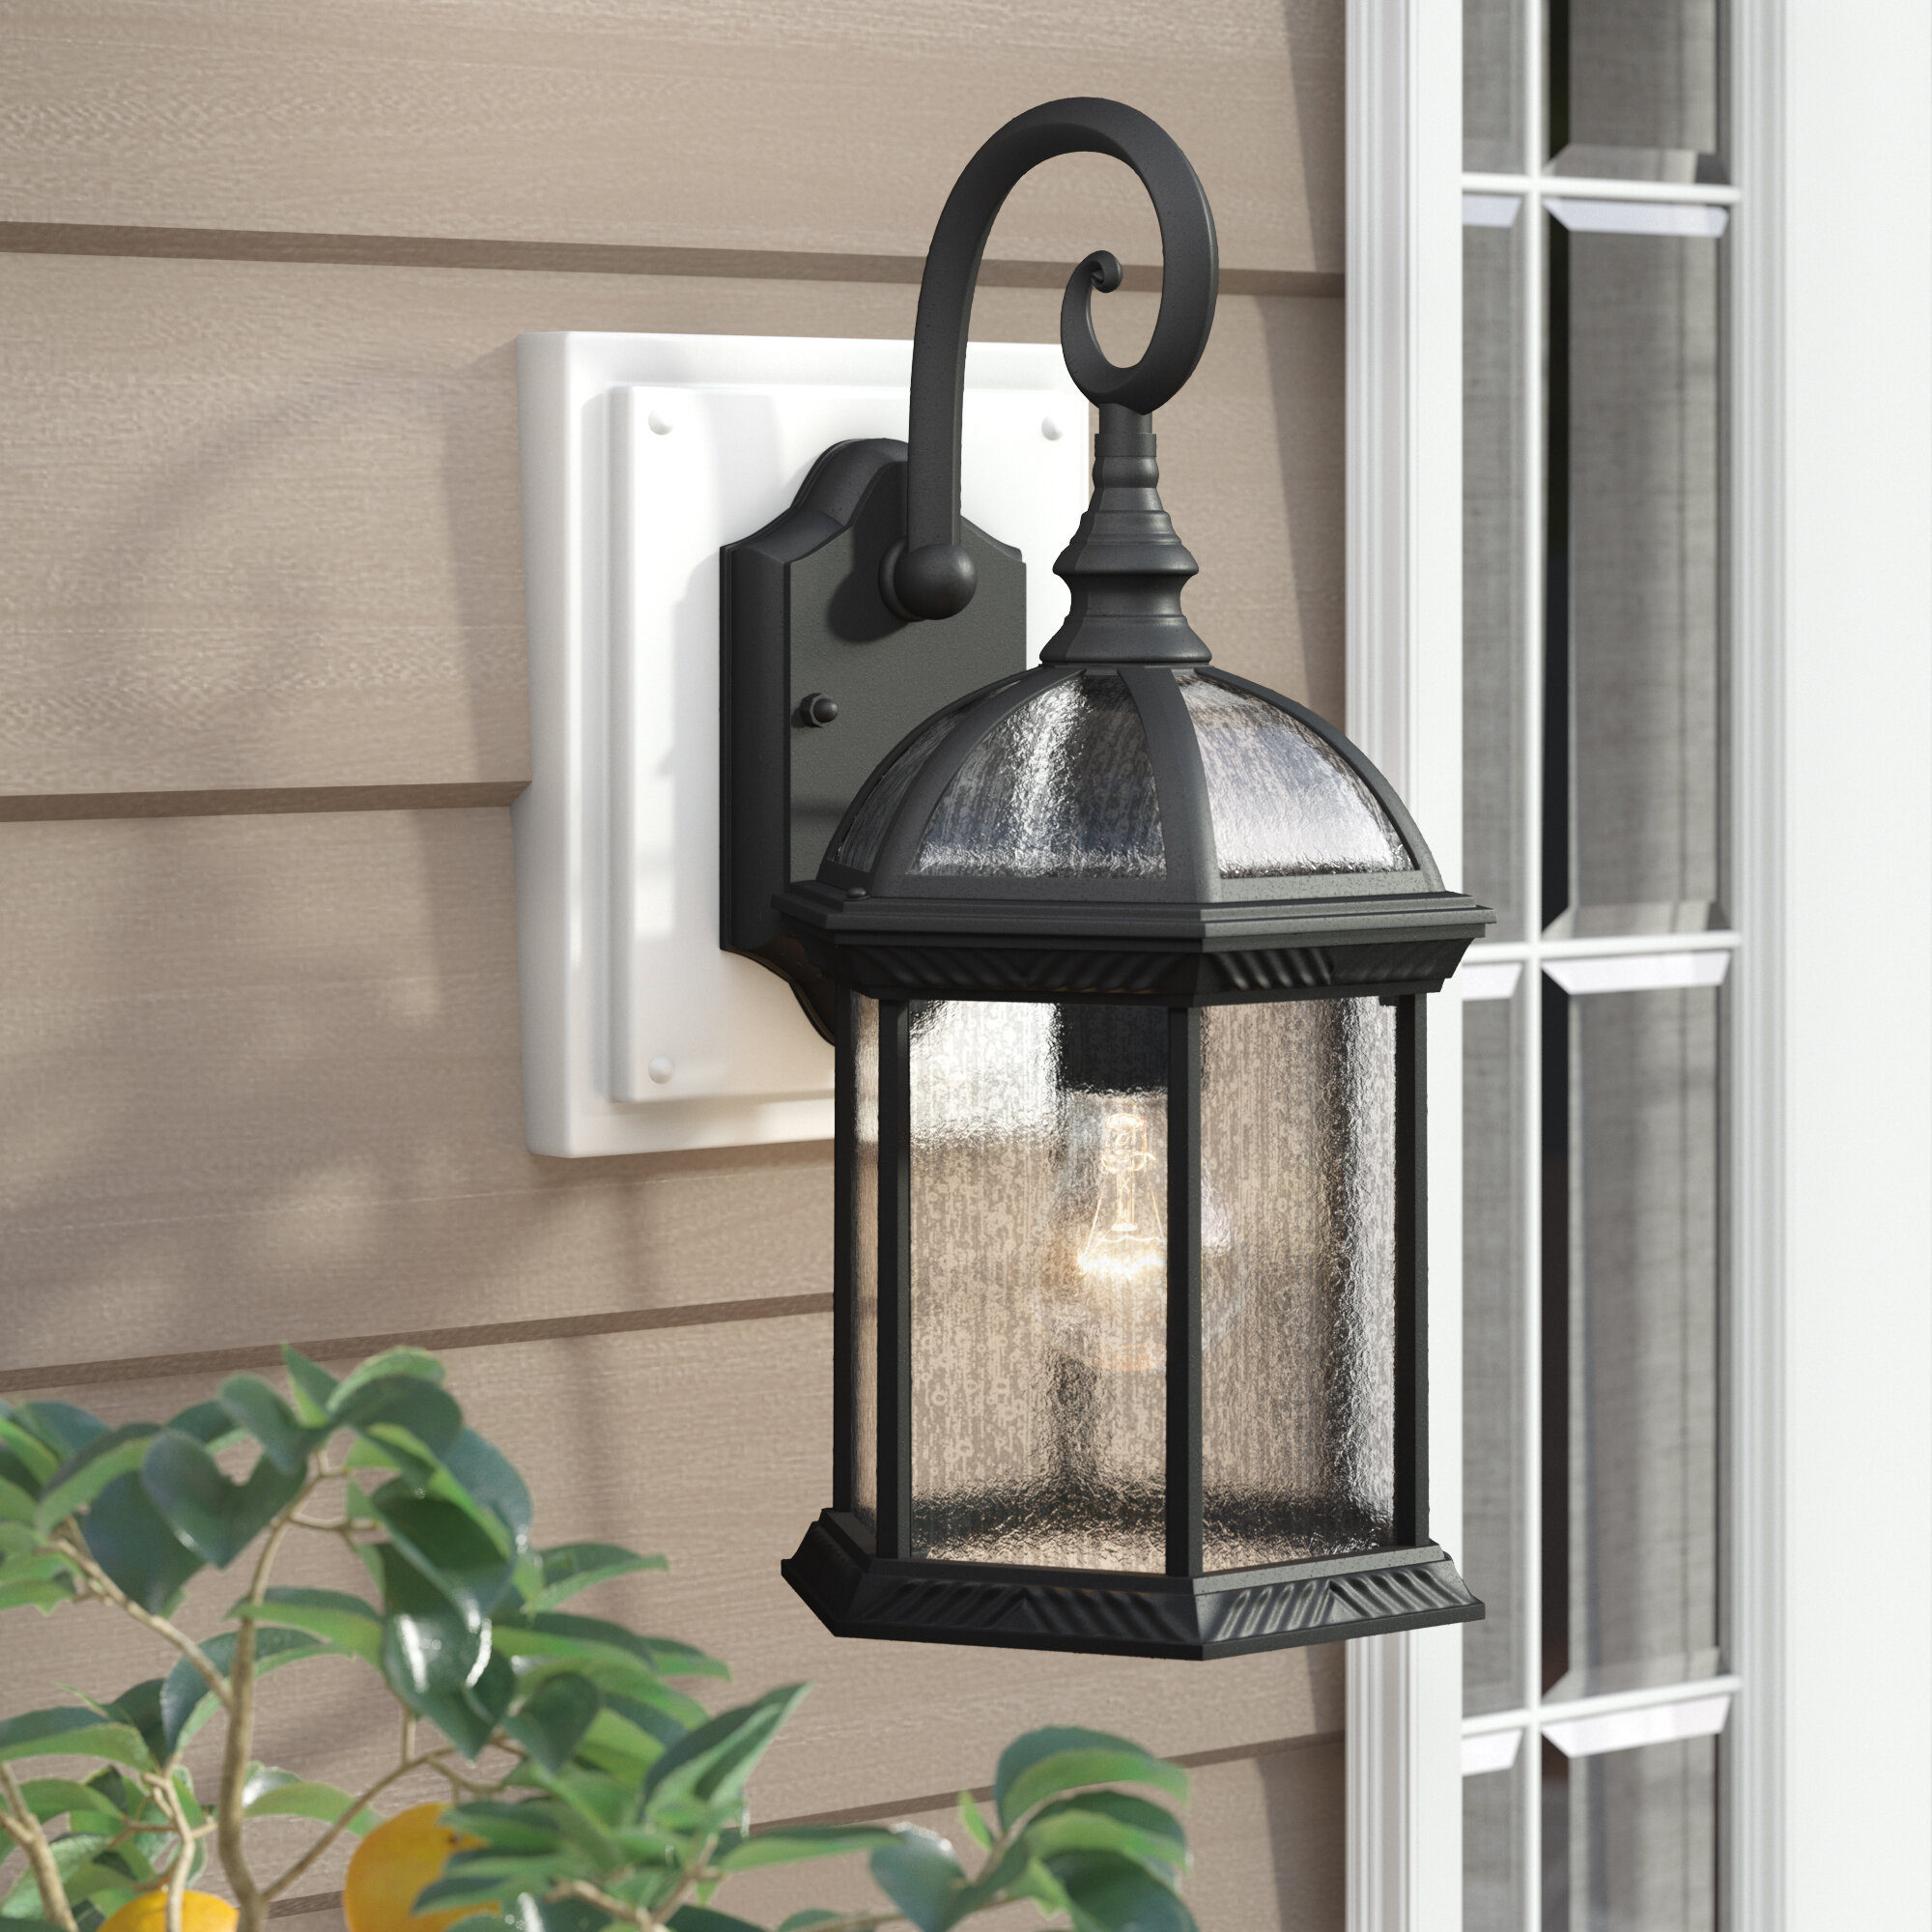 Sol 72 Outdoor Plainview Outdoor Wall Lantern Reviews Wayfair